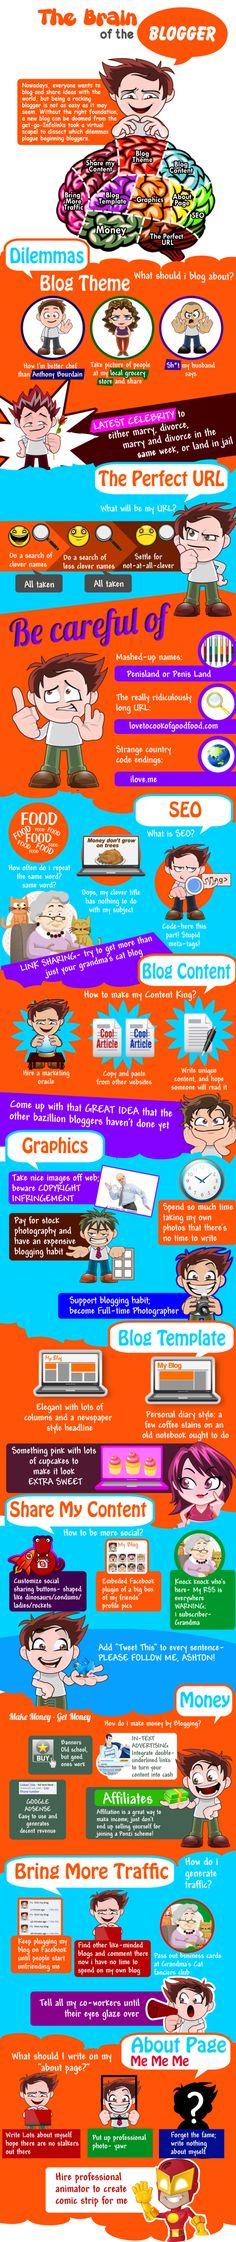 The brain of the blogger #infografia #infographic #socialmedia